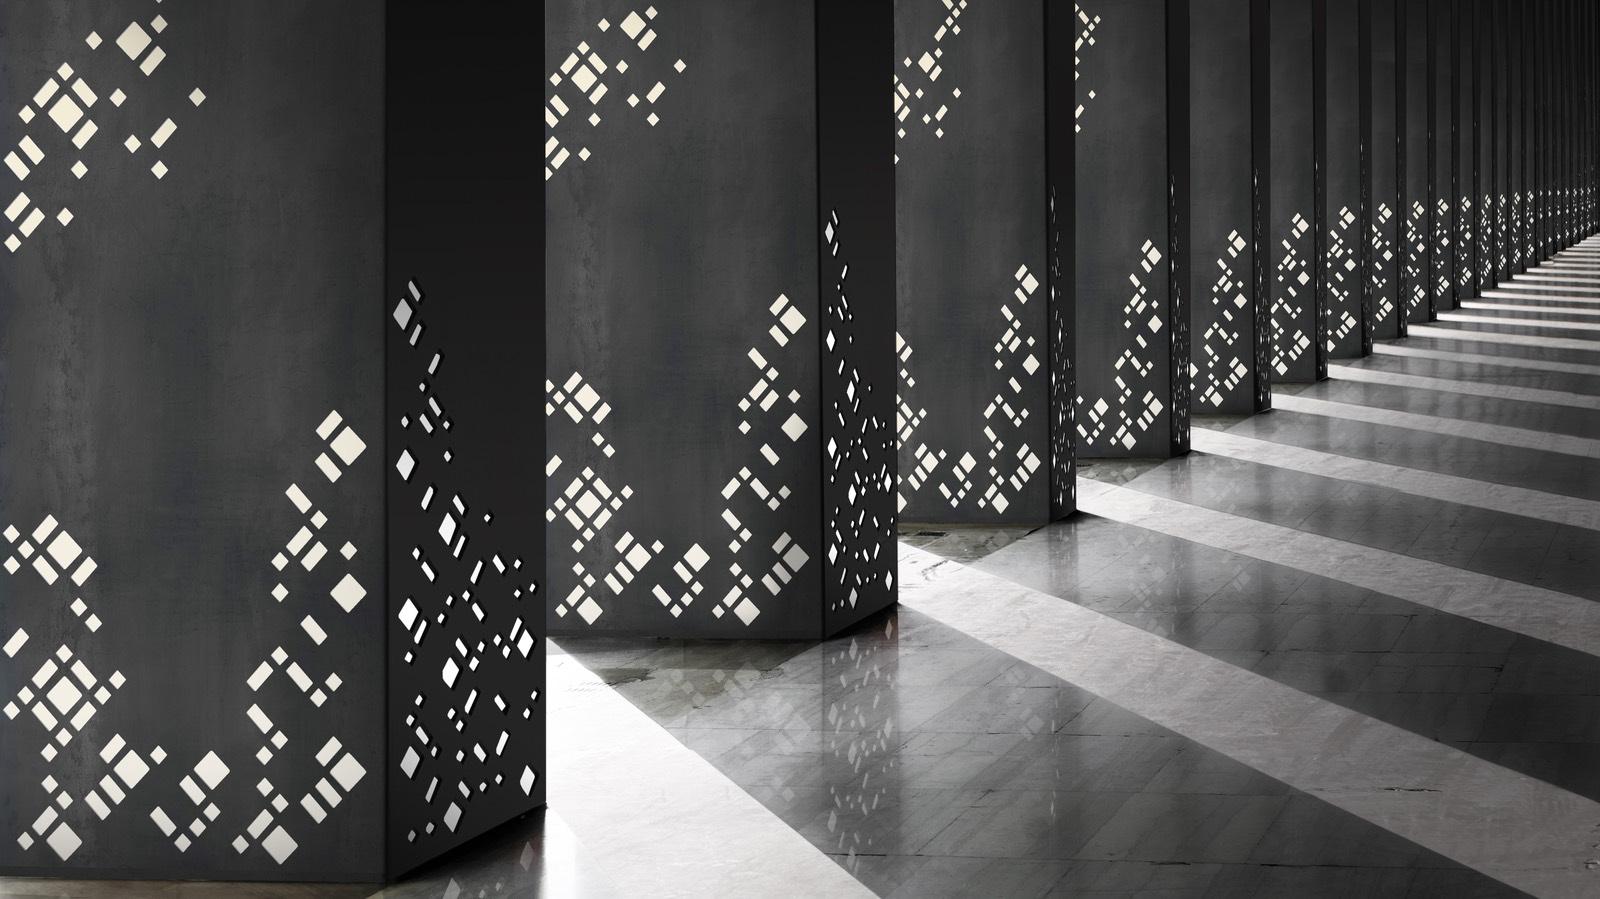 Laser Cut Metal Sheets - Moz Designs | Architectural ...